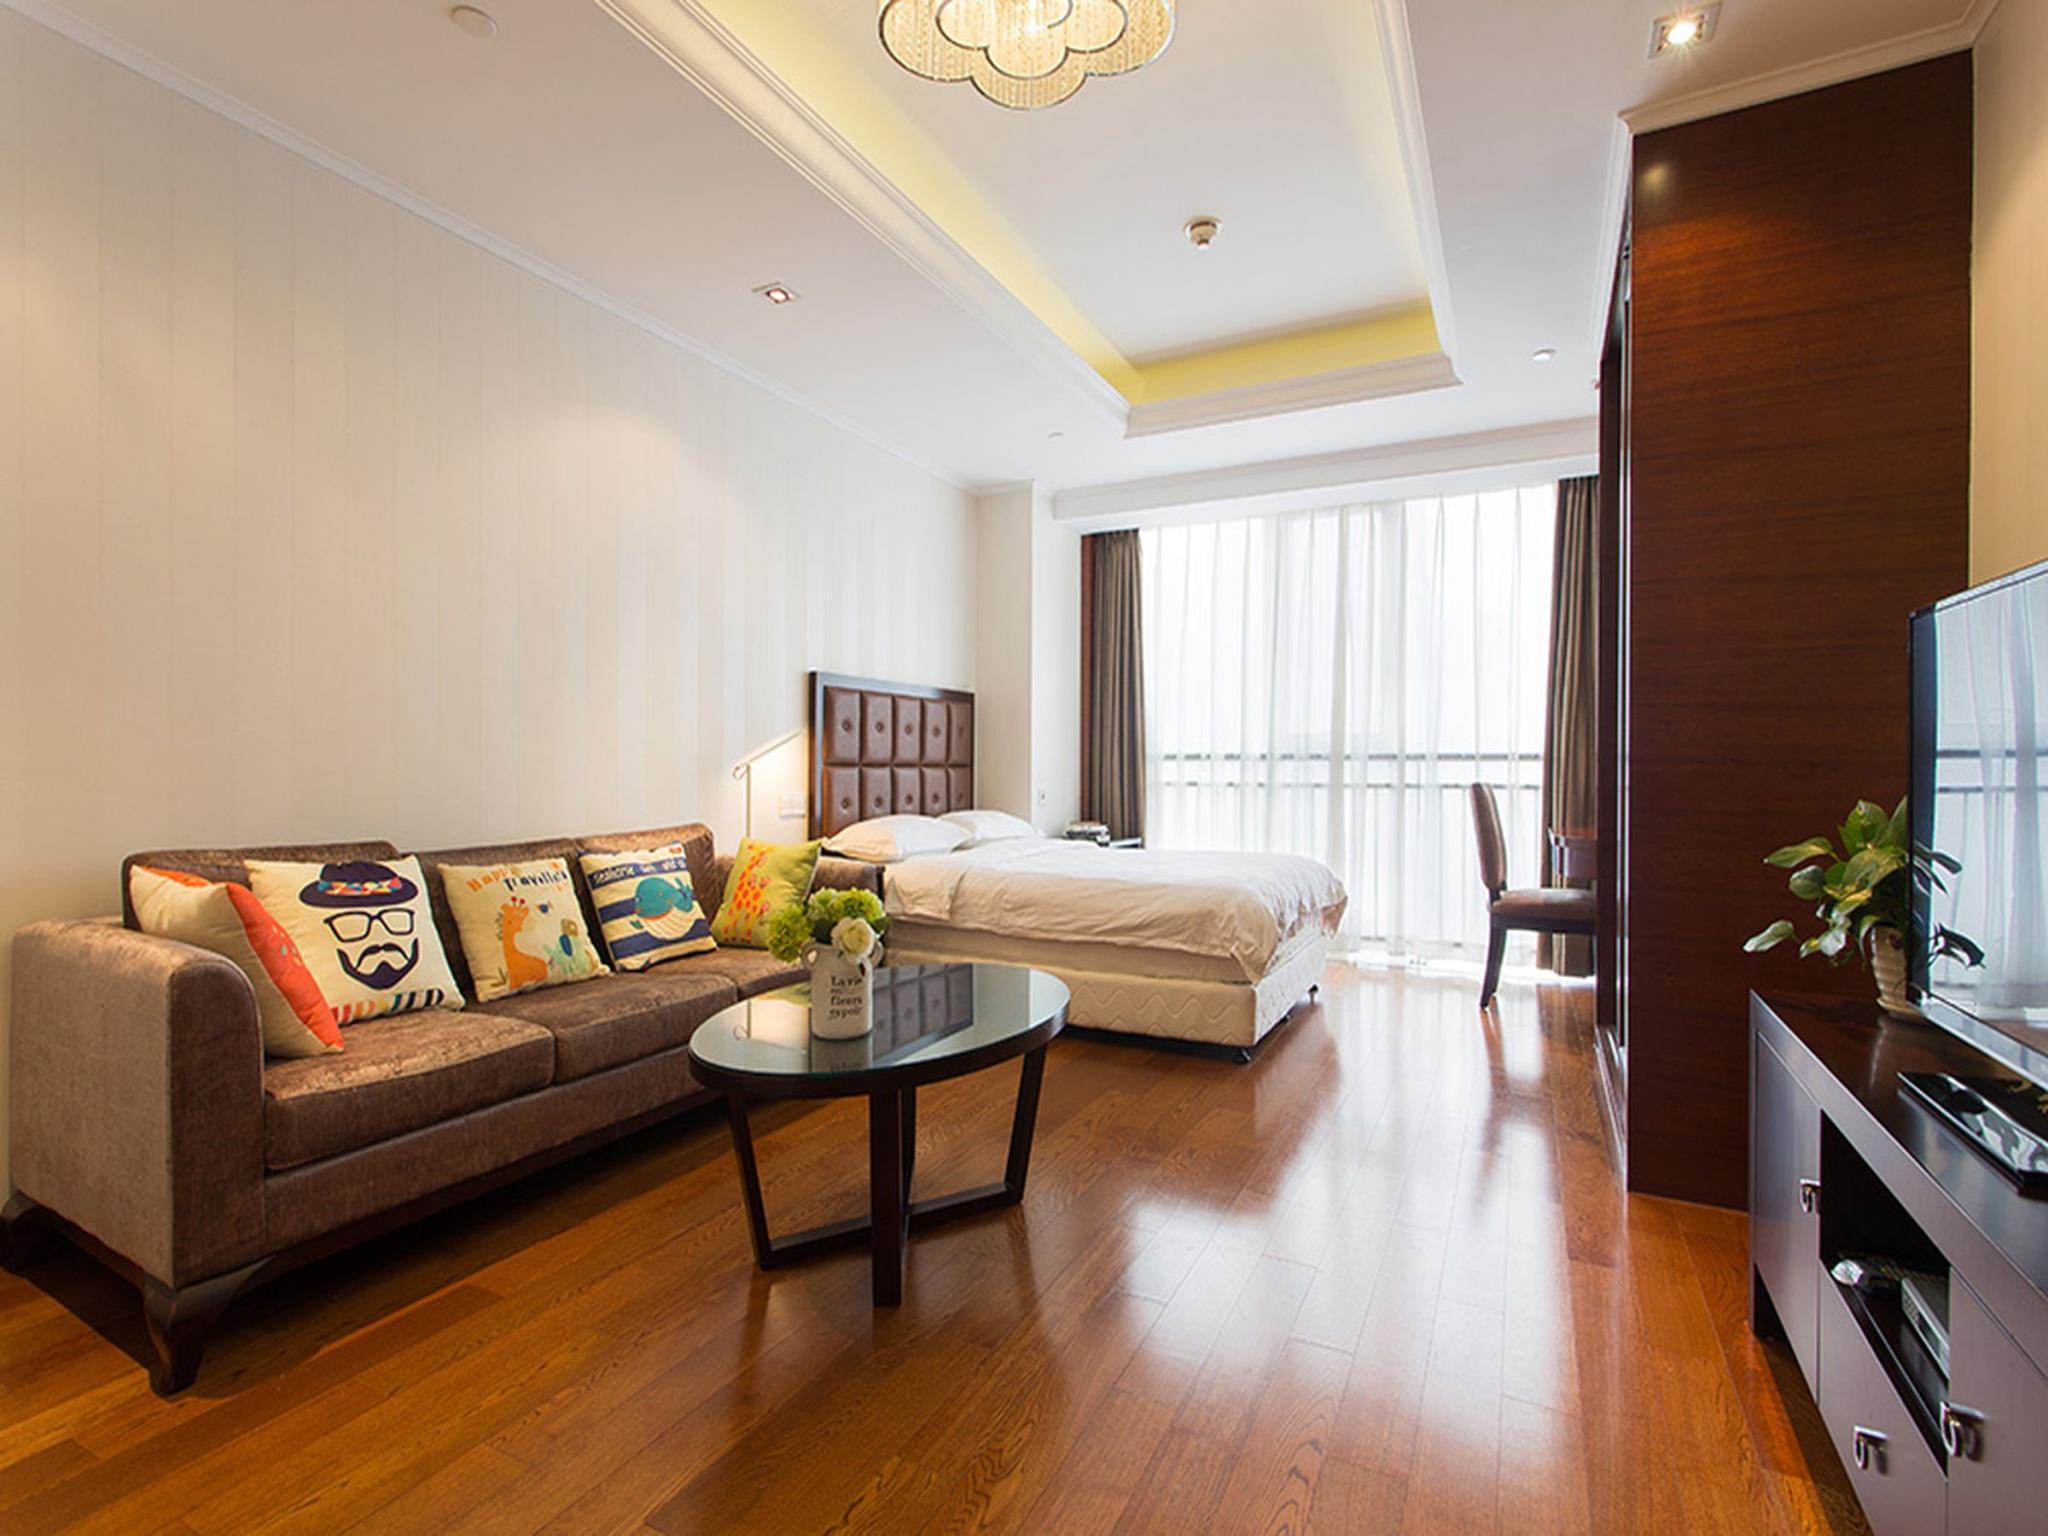 Qingdao Jinshan We Holiday Apartment Wu Si Square, Qingdao